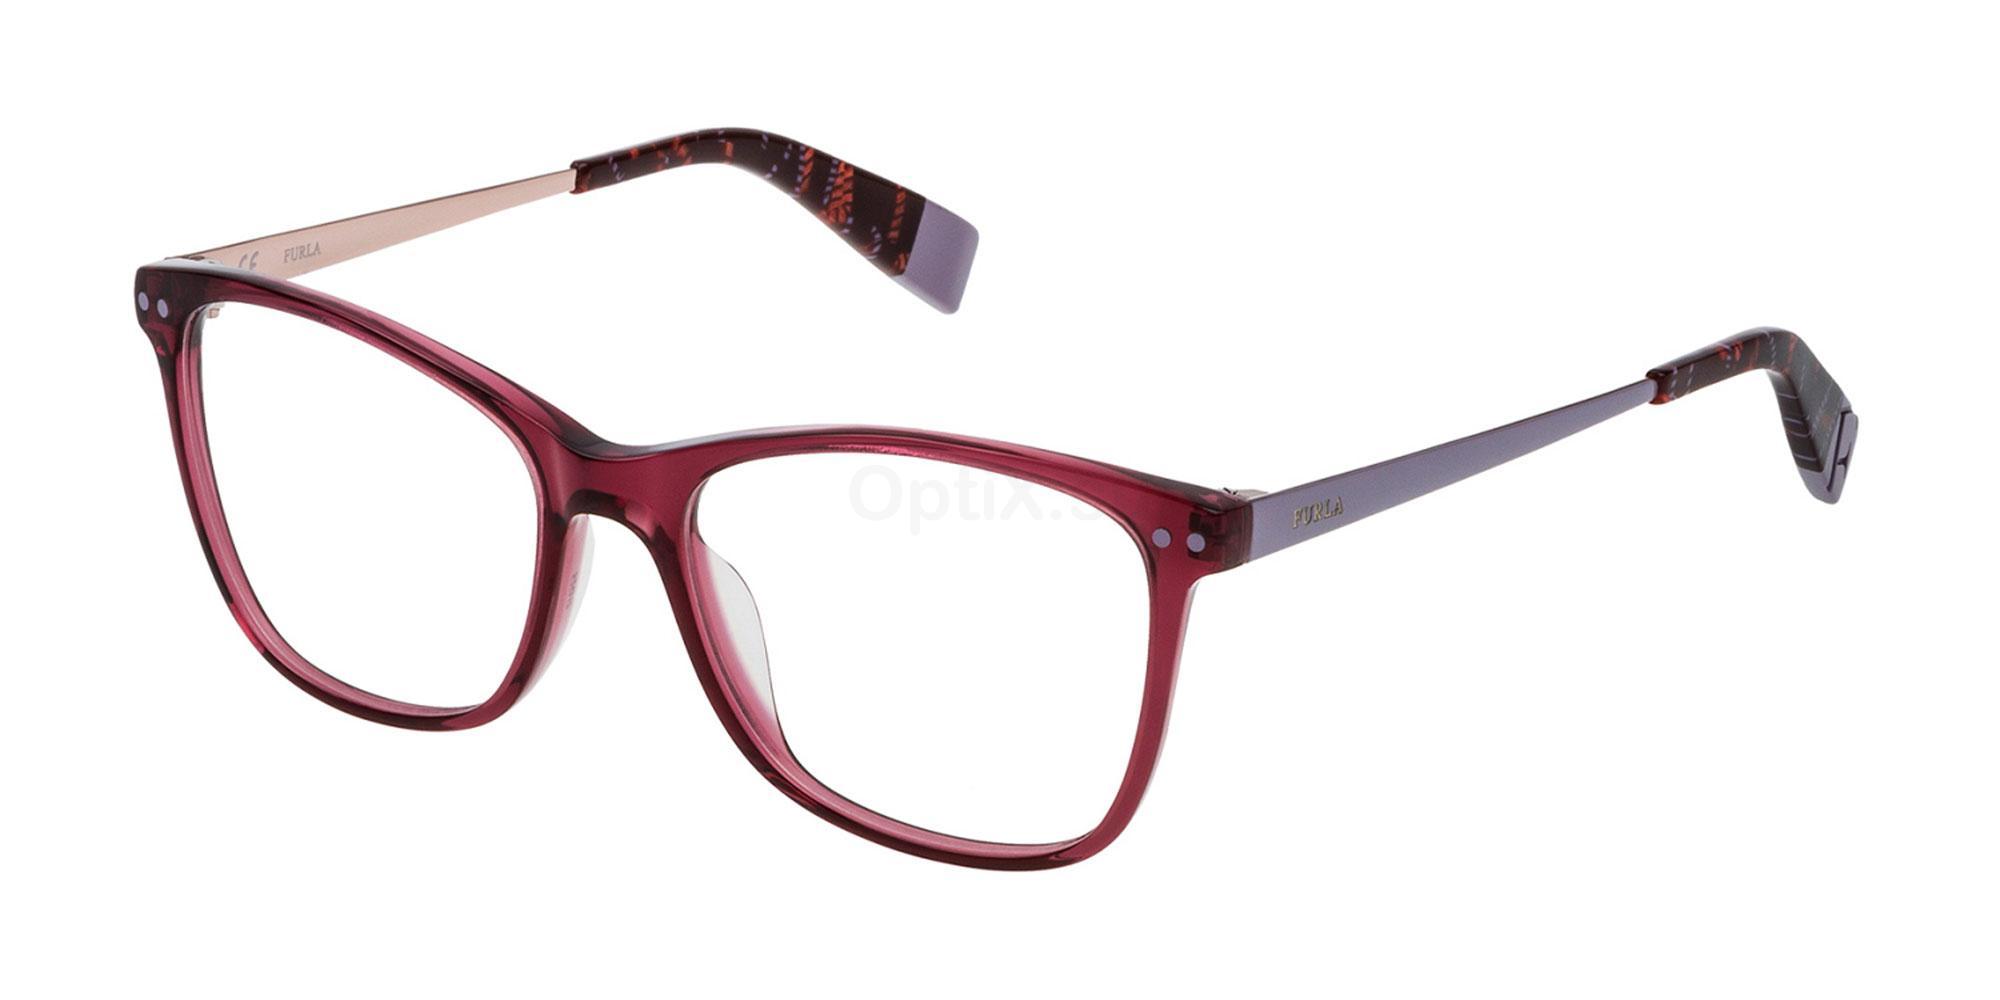 0W48 VFU084 Glasses, Furla